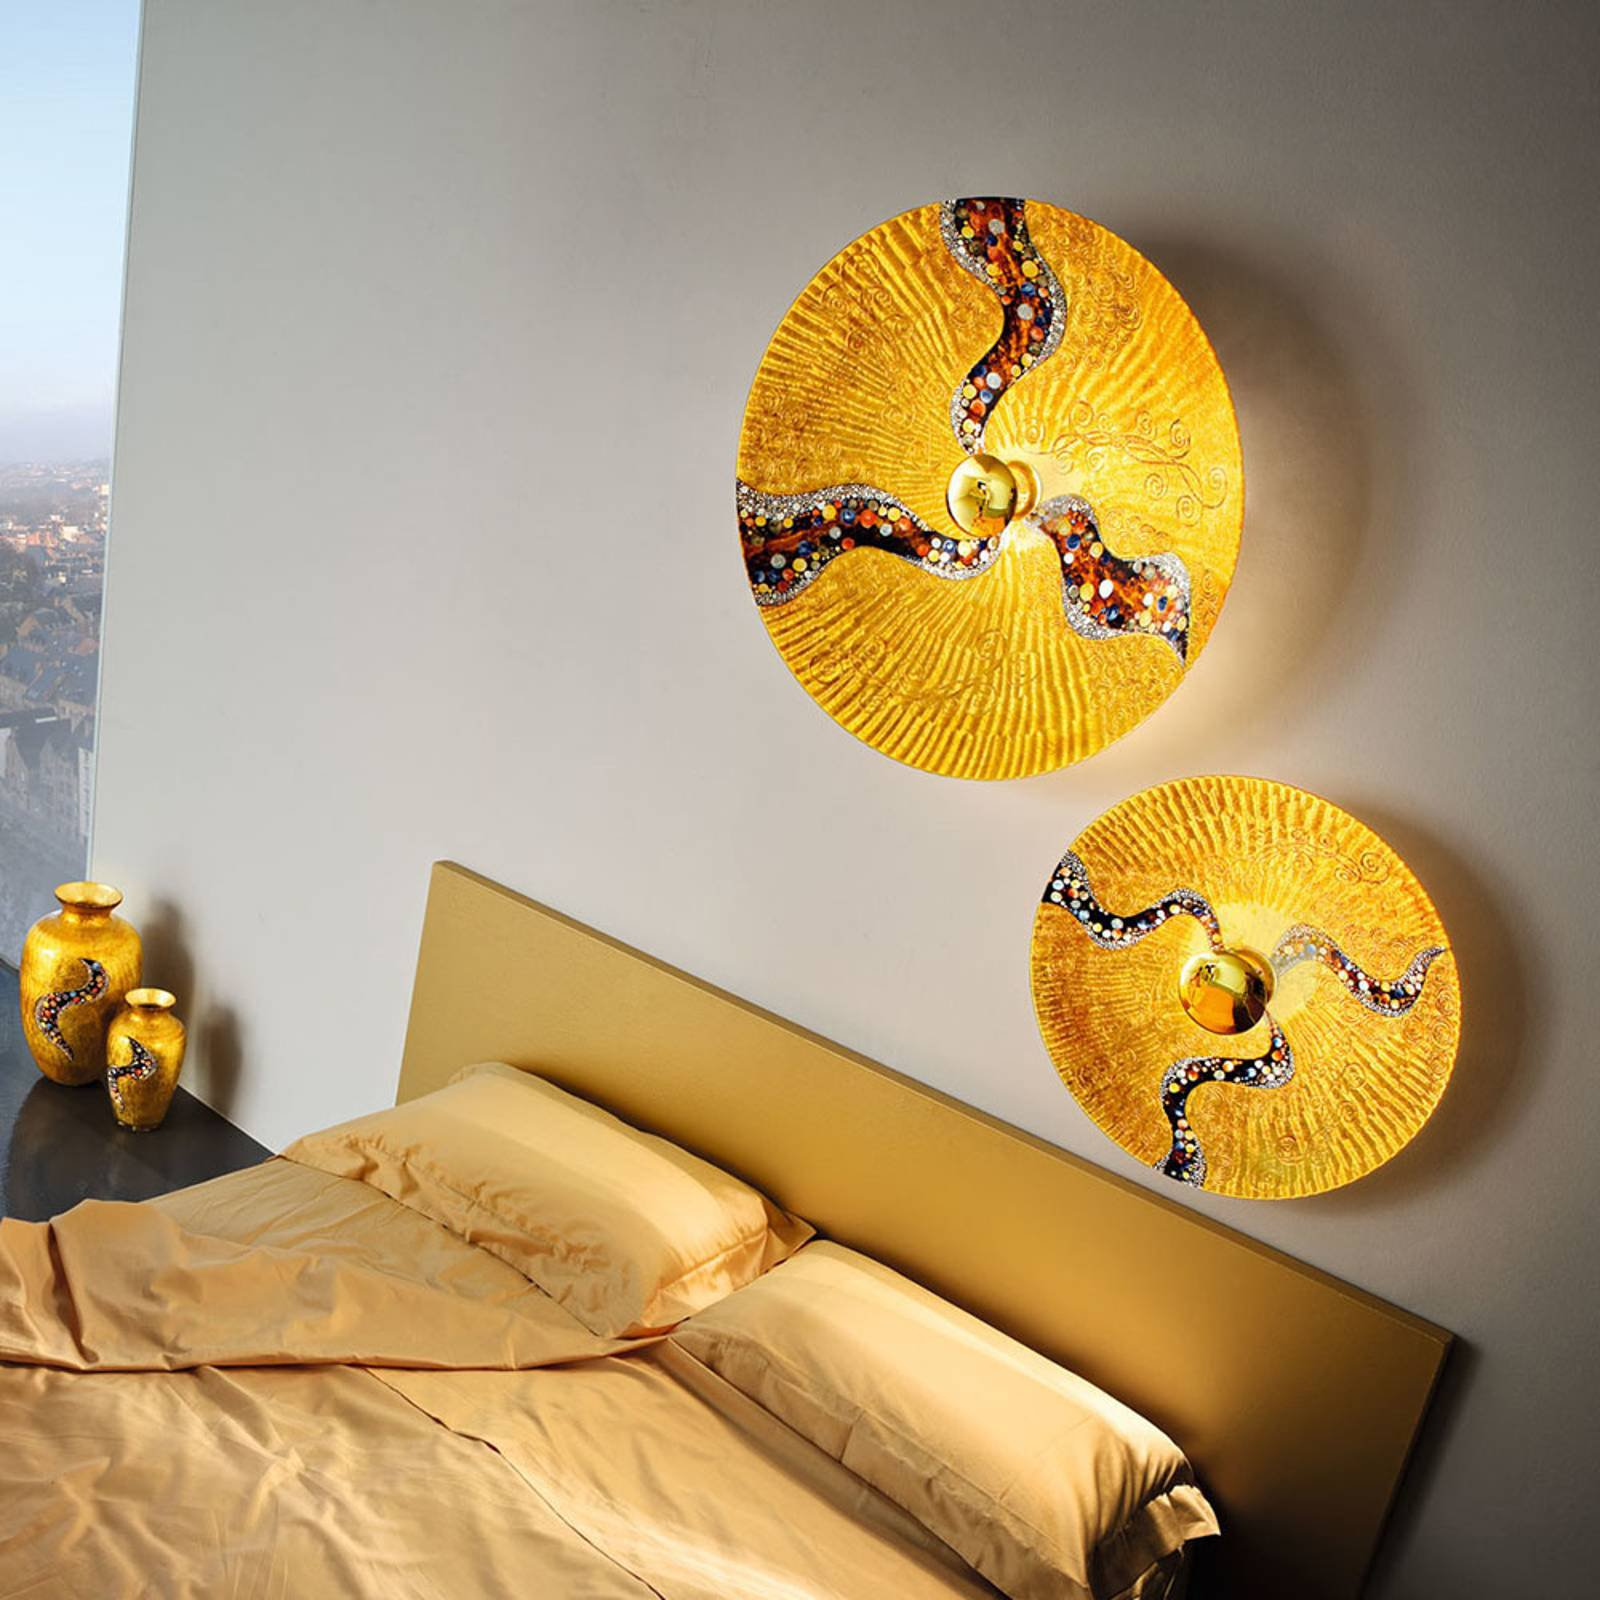 KOLARZ Luna Kiss Gold vegglampe, 24 karat, Ø 54 cm